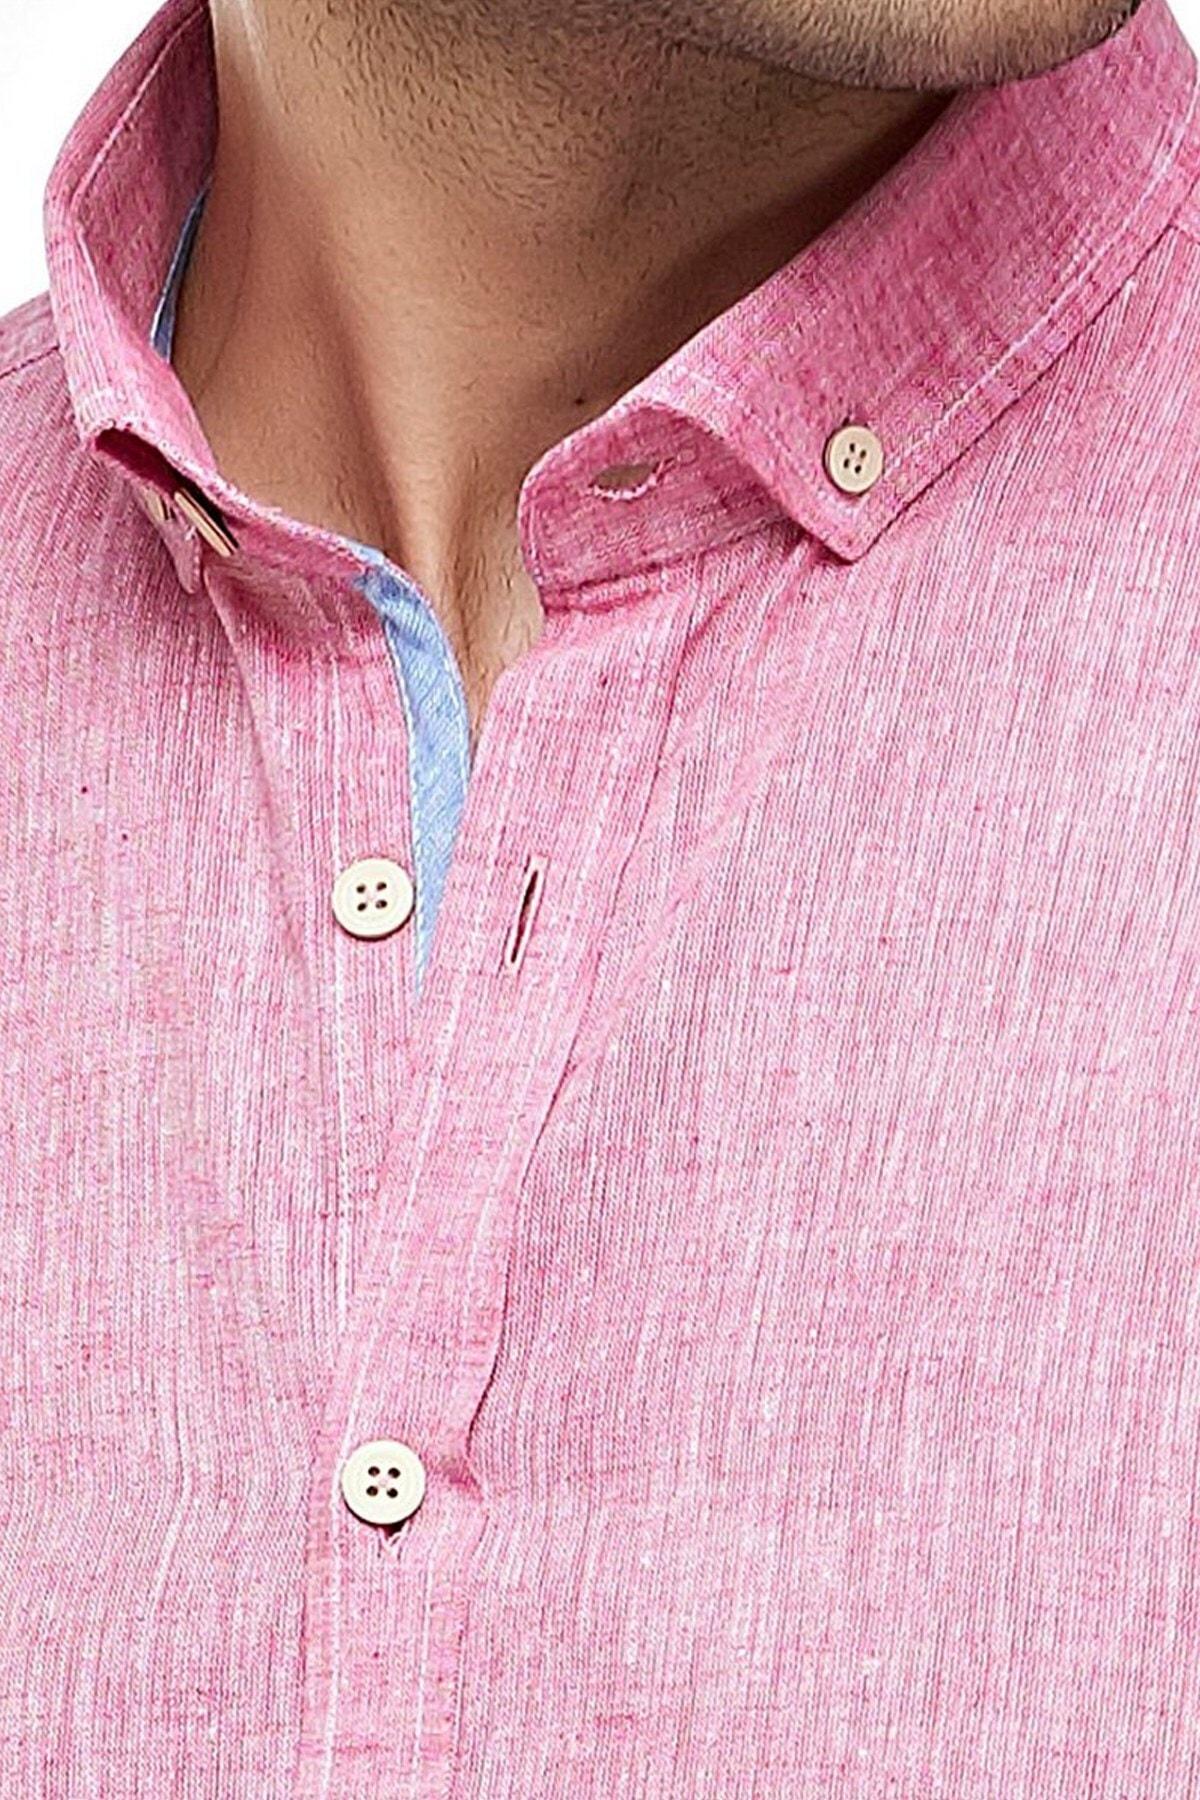 Ottomoda Kısa Kollu Keten Gömlek Pink 2